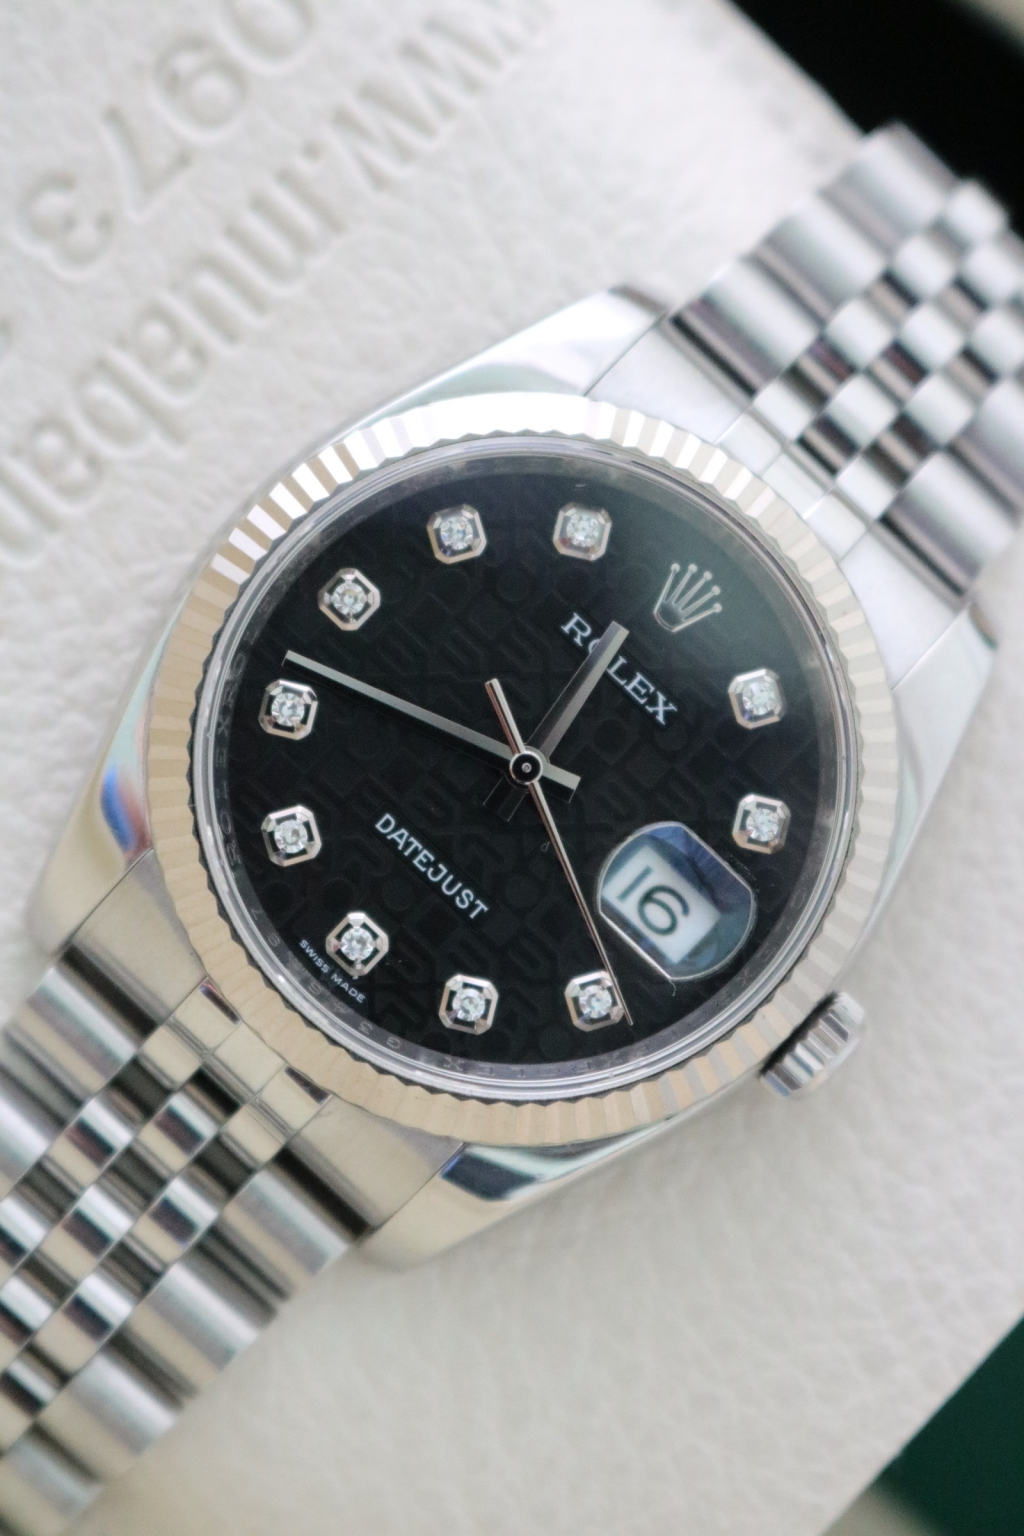 Đồng hồ rolex datejust 6 số 116234 – mặt vi tính xoàn – size 36mm